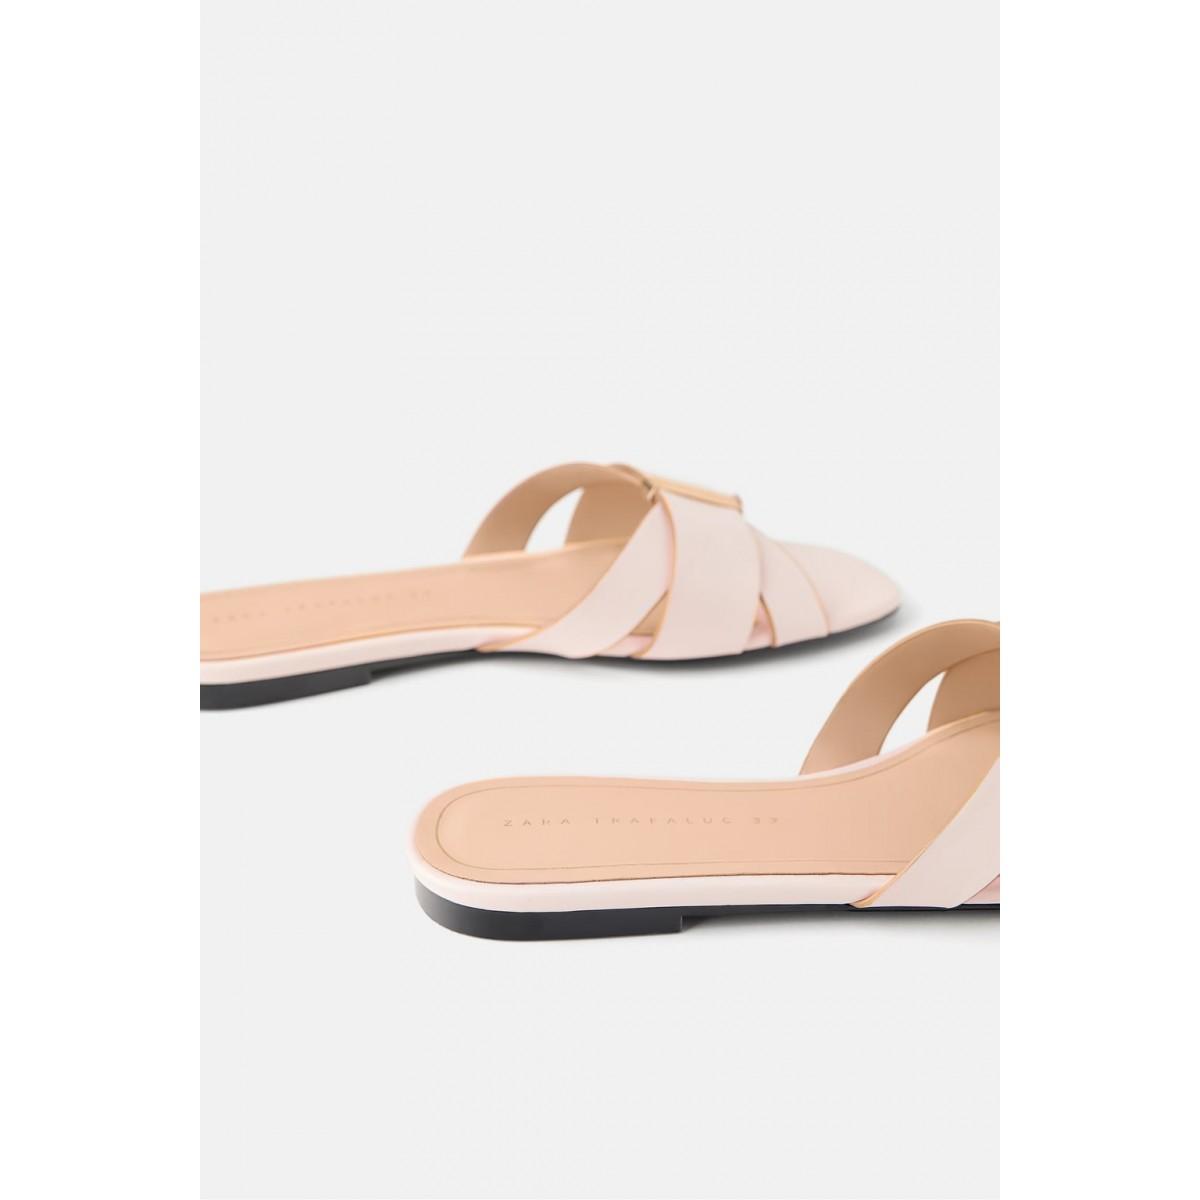 Zara Flat Sandals With Metal Trim